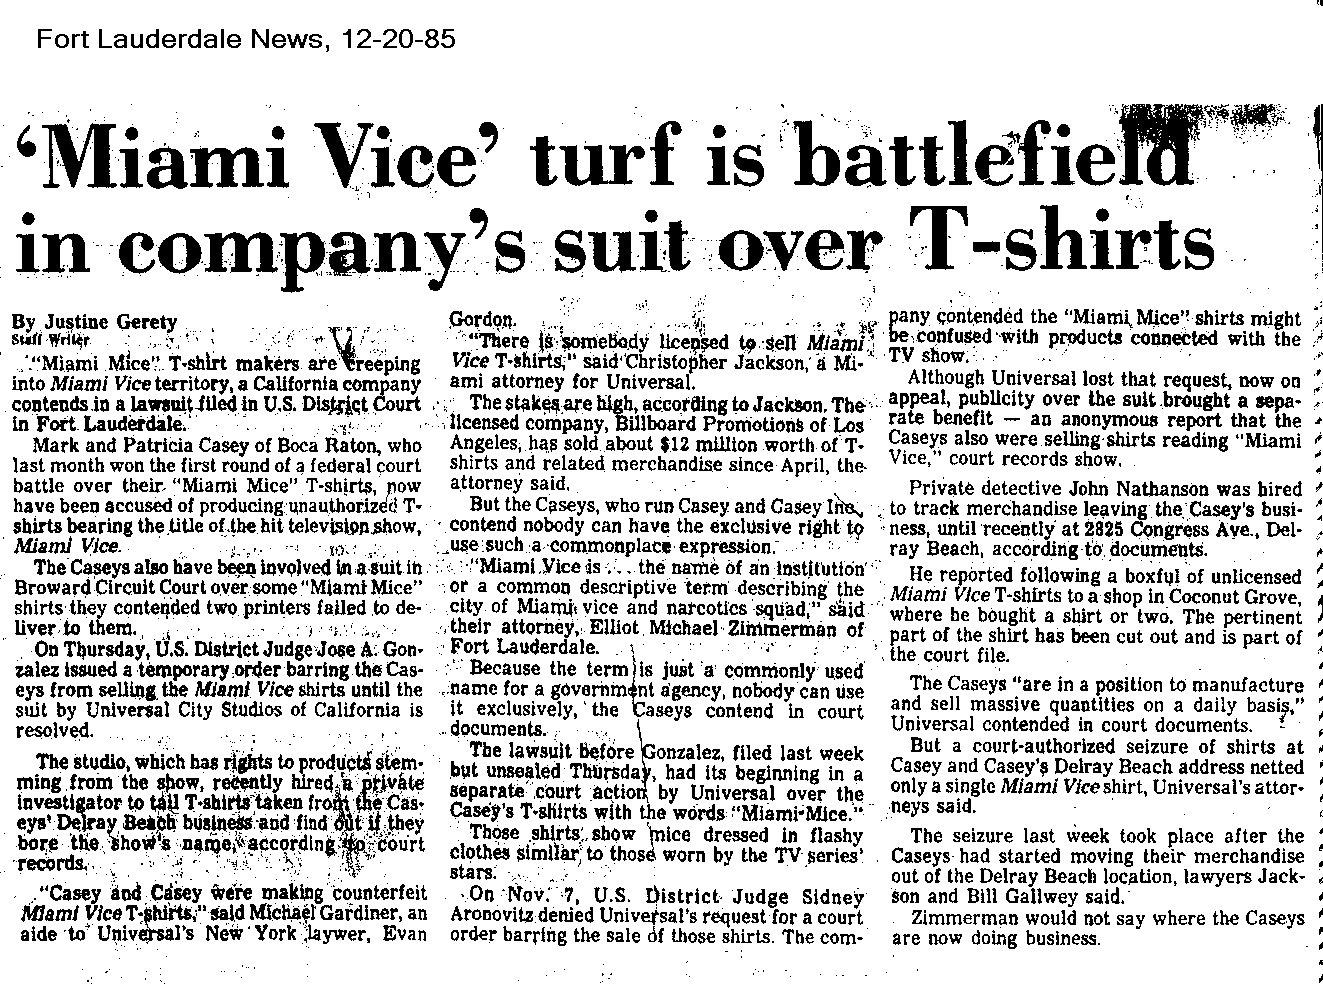 1985-12-20_News_Miami_Vice_v._Casey